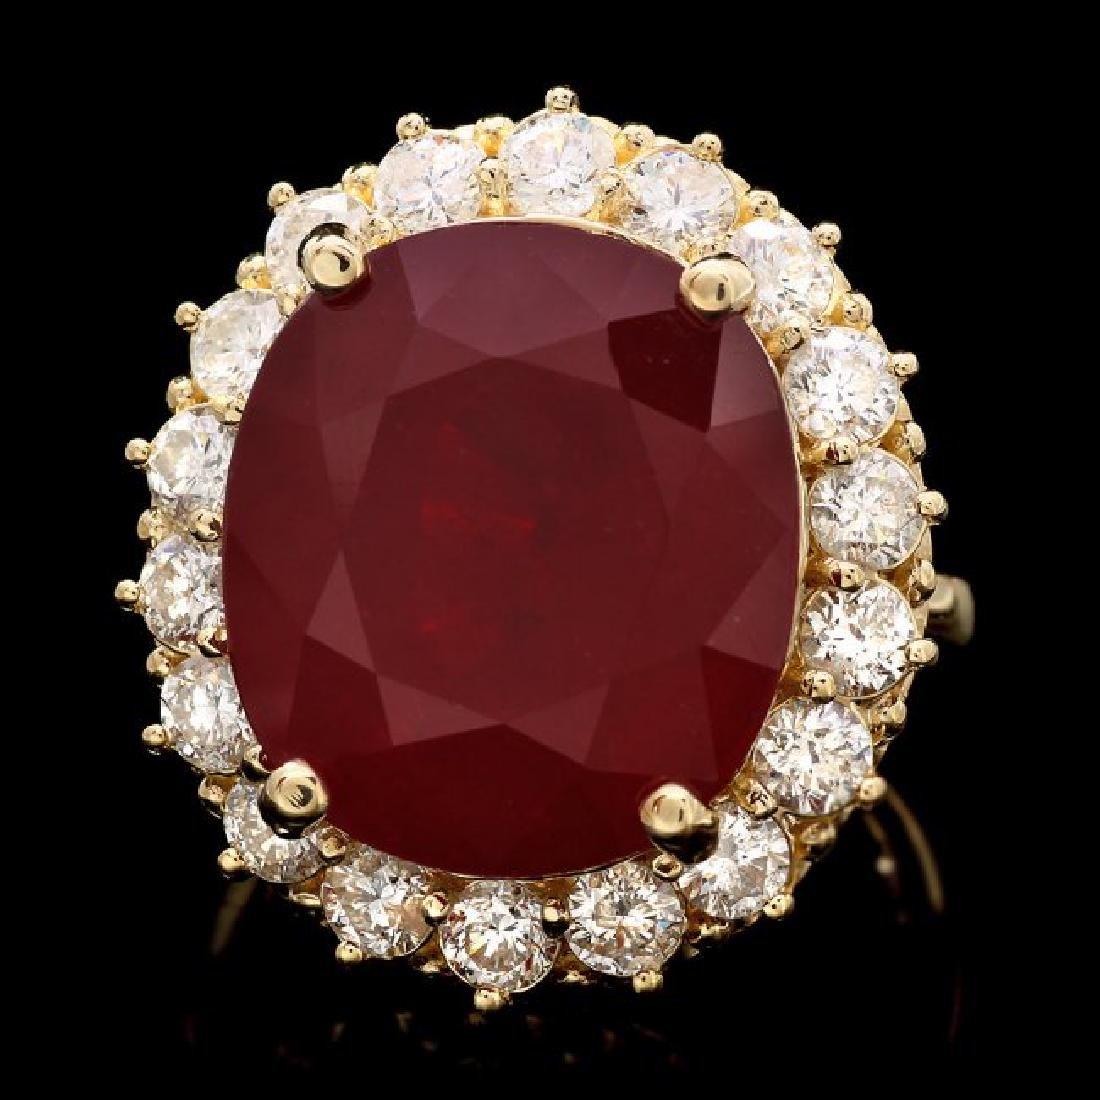 14k Yellow Gold 21.50ct Ruby 2.00ct Diamond Ring